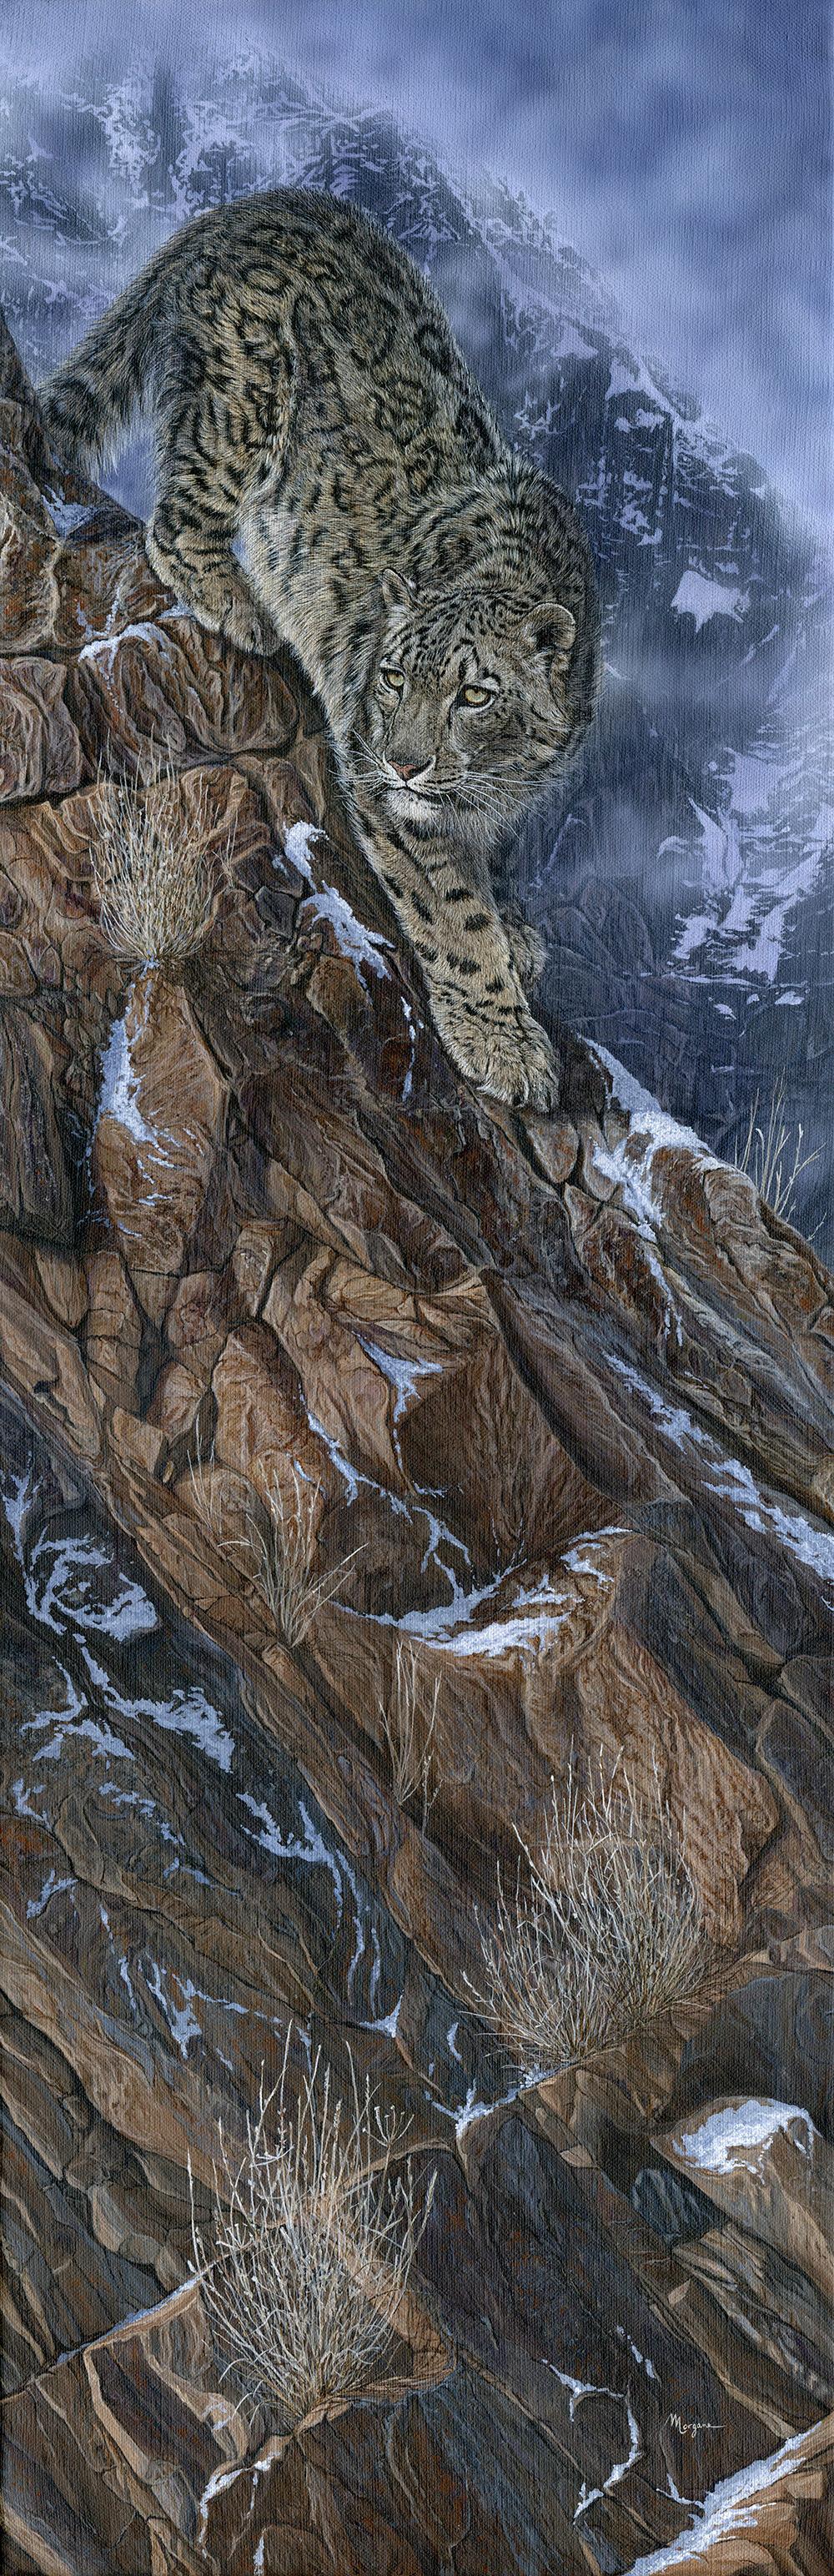 Morgane Antoine, The Mountaineer, Acrylic on canvas, 90 cm x 30 cm x 2 cm,  http://www.morganeantoine.com